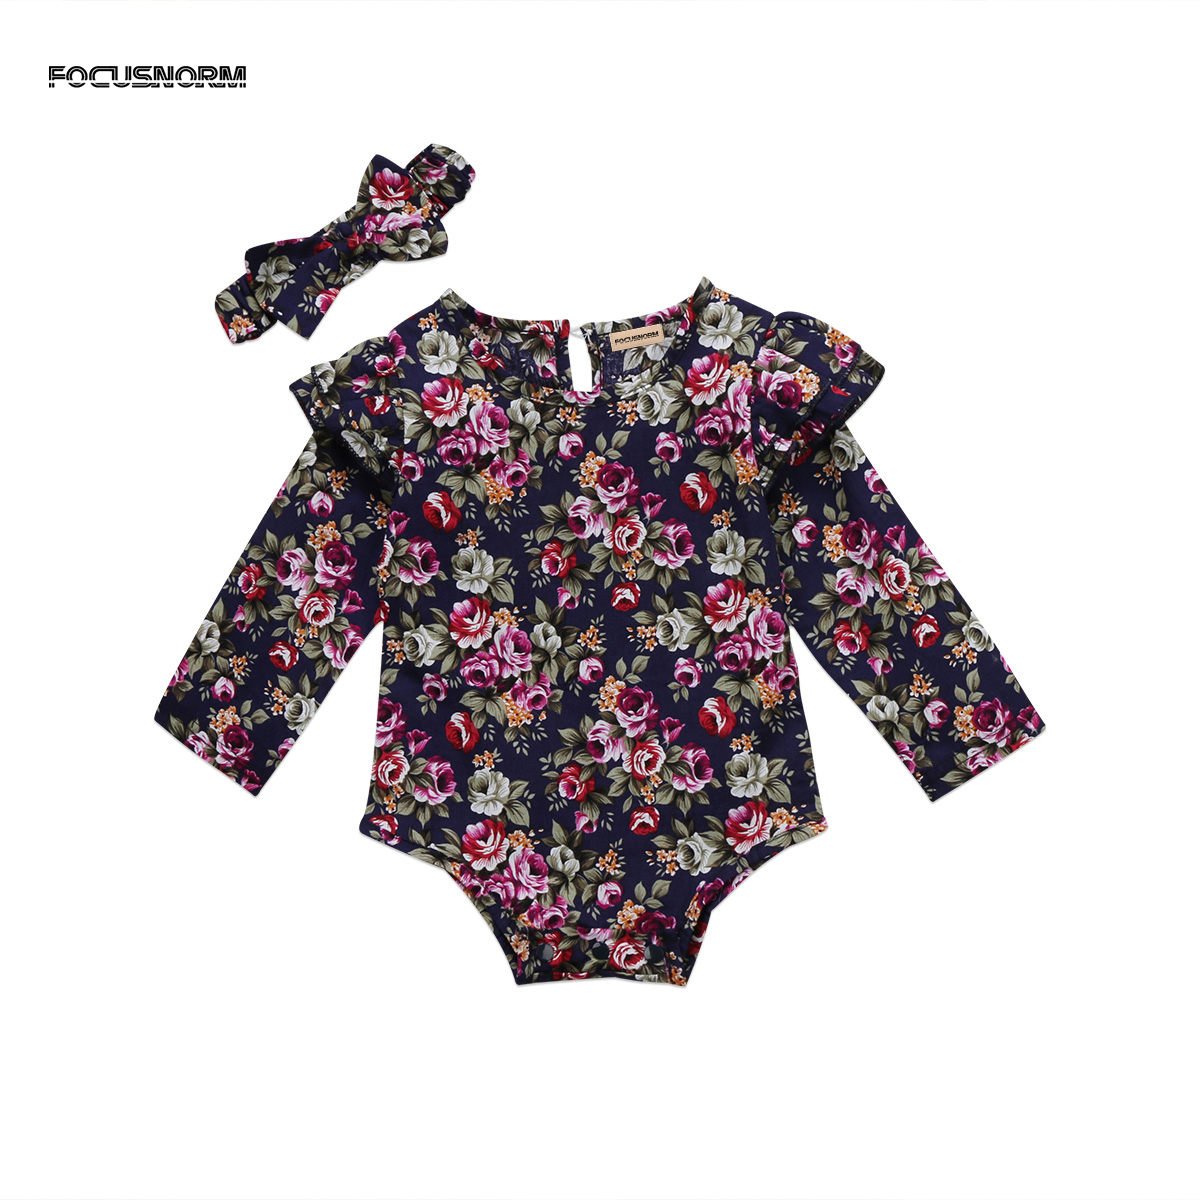 Vintage Floral Romper Jumpsuit Headband Clothes Set Toddler Infant Baby Girl Playsuit Outfit